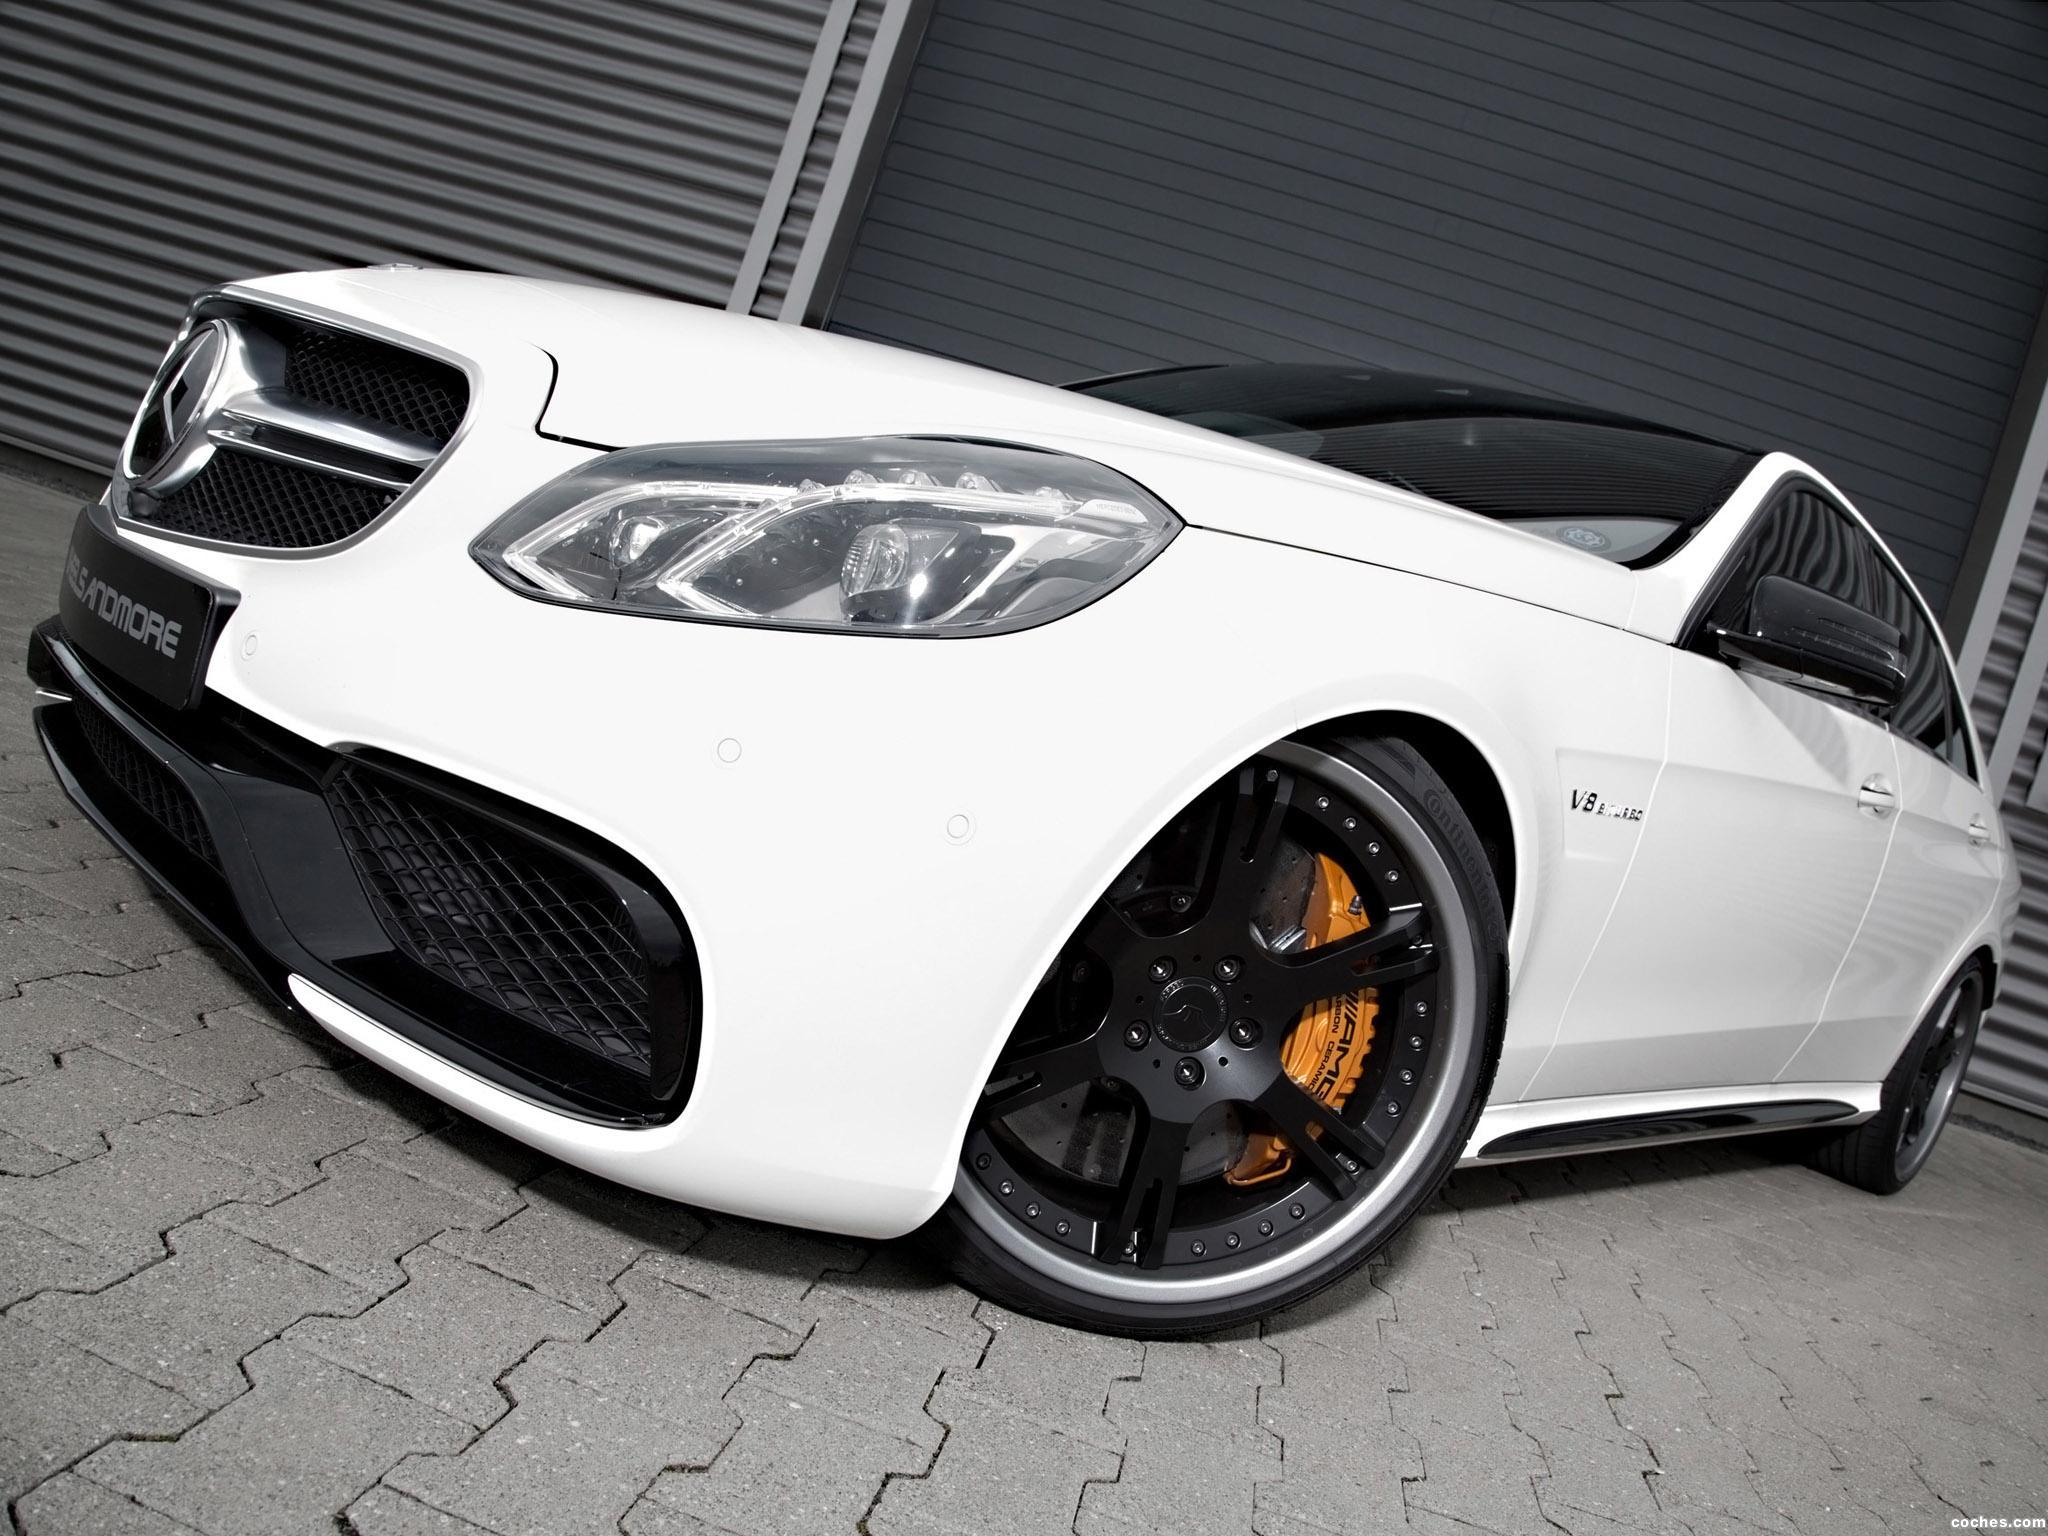 Foto 0 de Wheelsandmore Mercedes E63 AMG Seven 11 2013